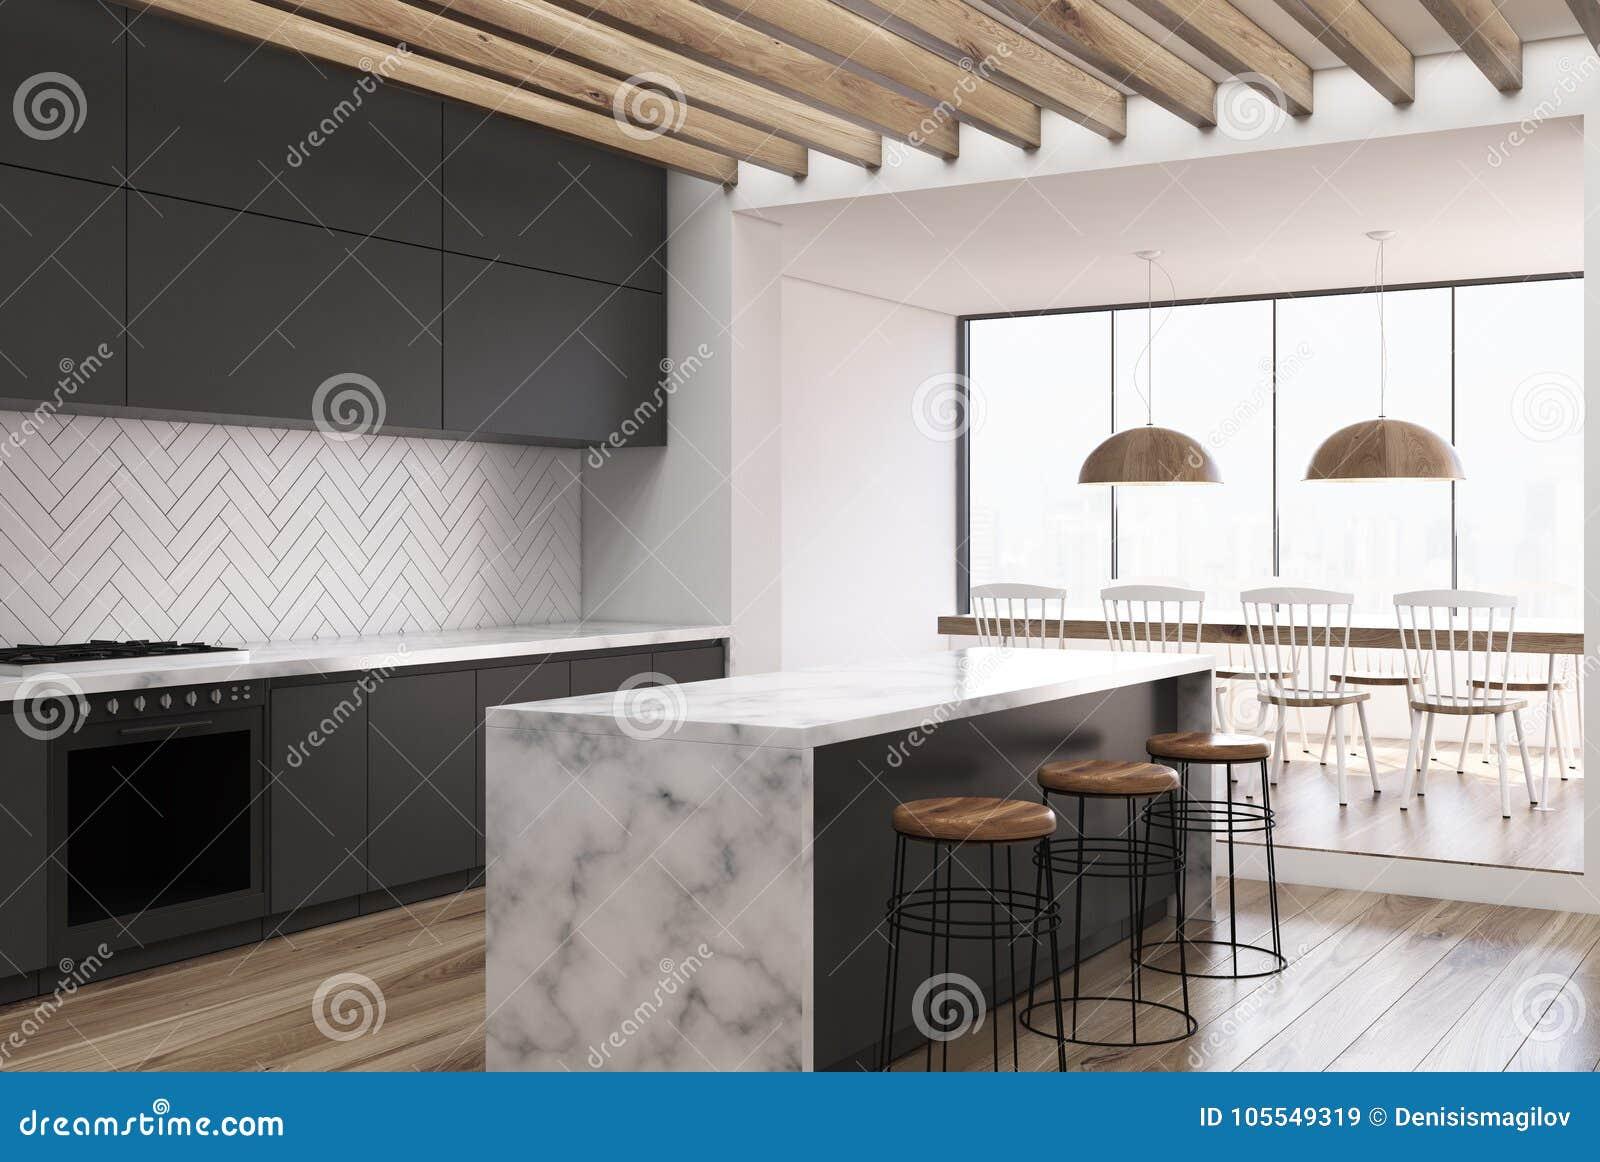 Marmer Zwart Keuken : Zwarte houten keuken marmeren barkant stock illustratie